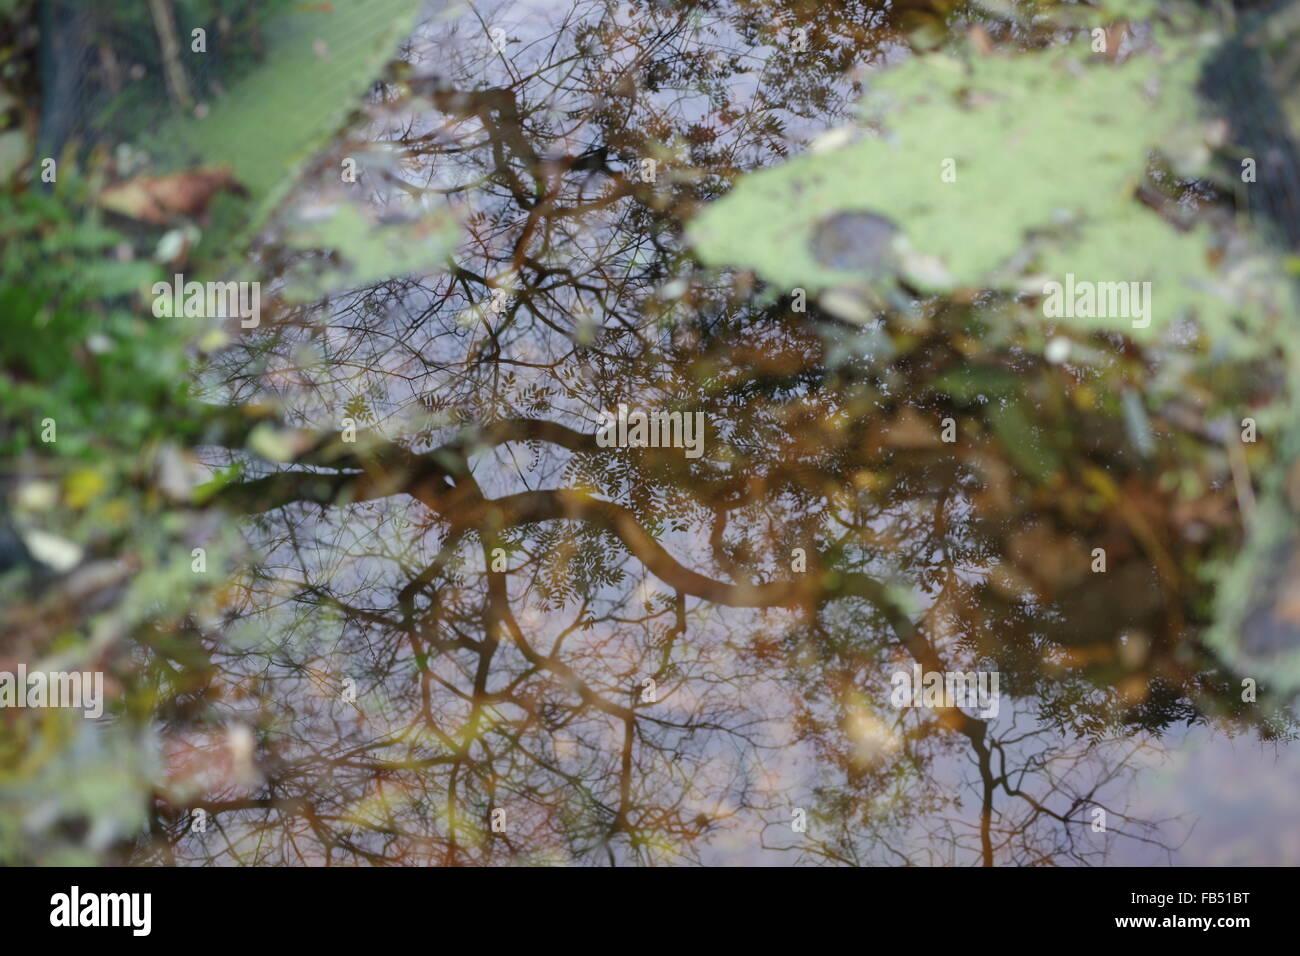 tree-reflection-in-pond-FB51BT.jpg